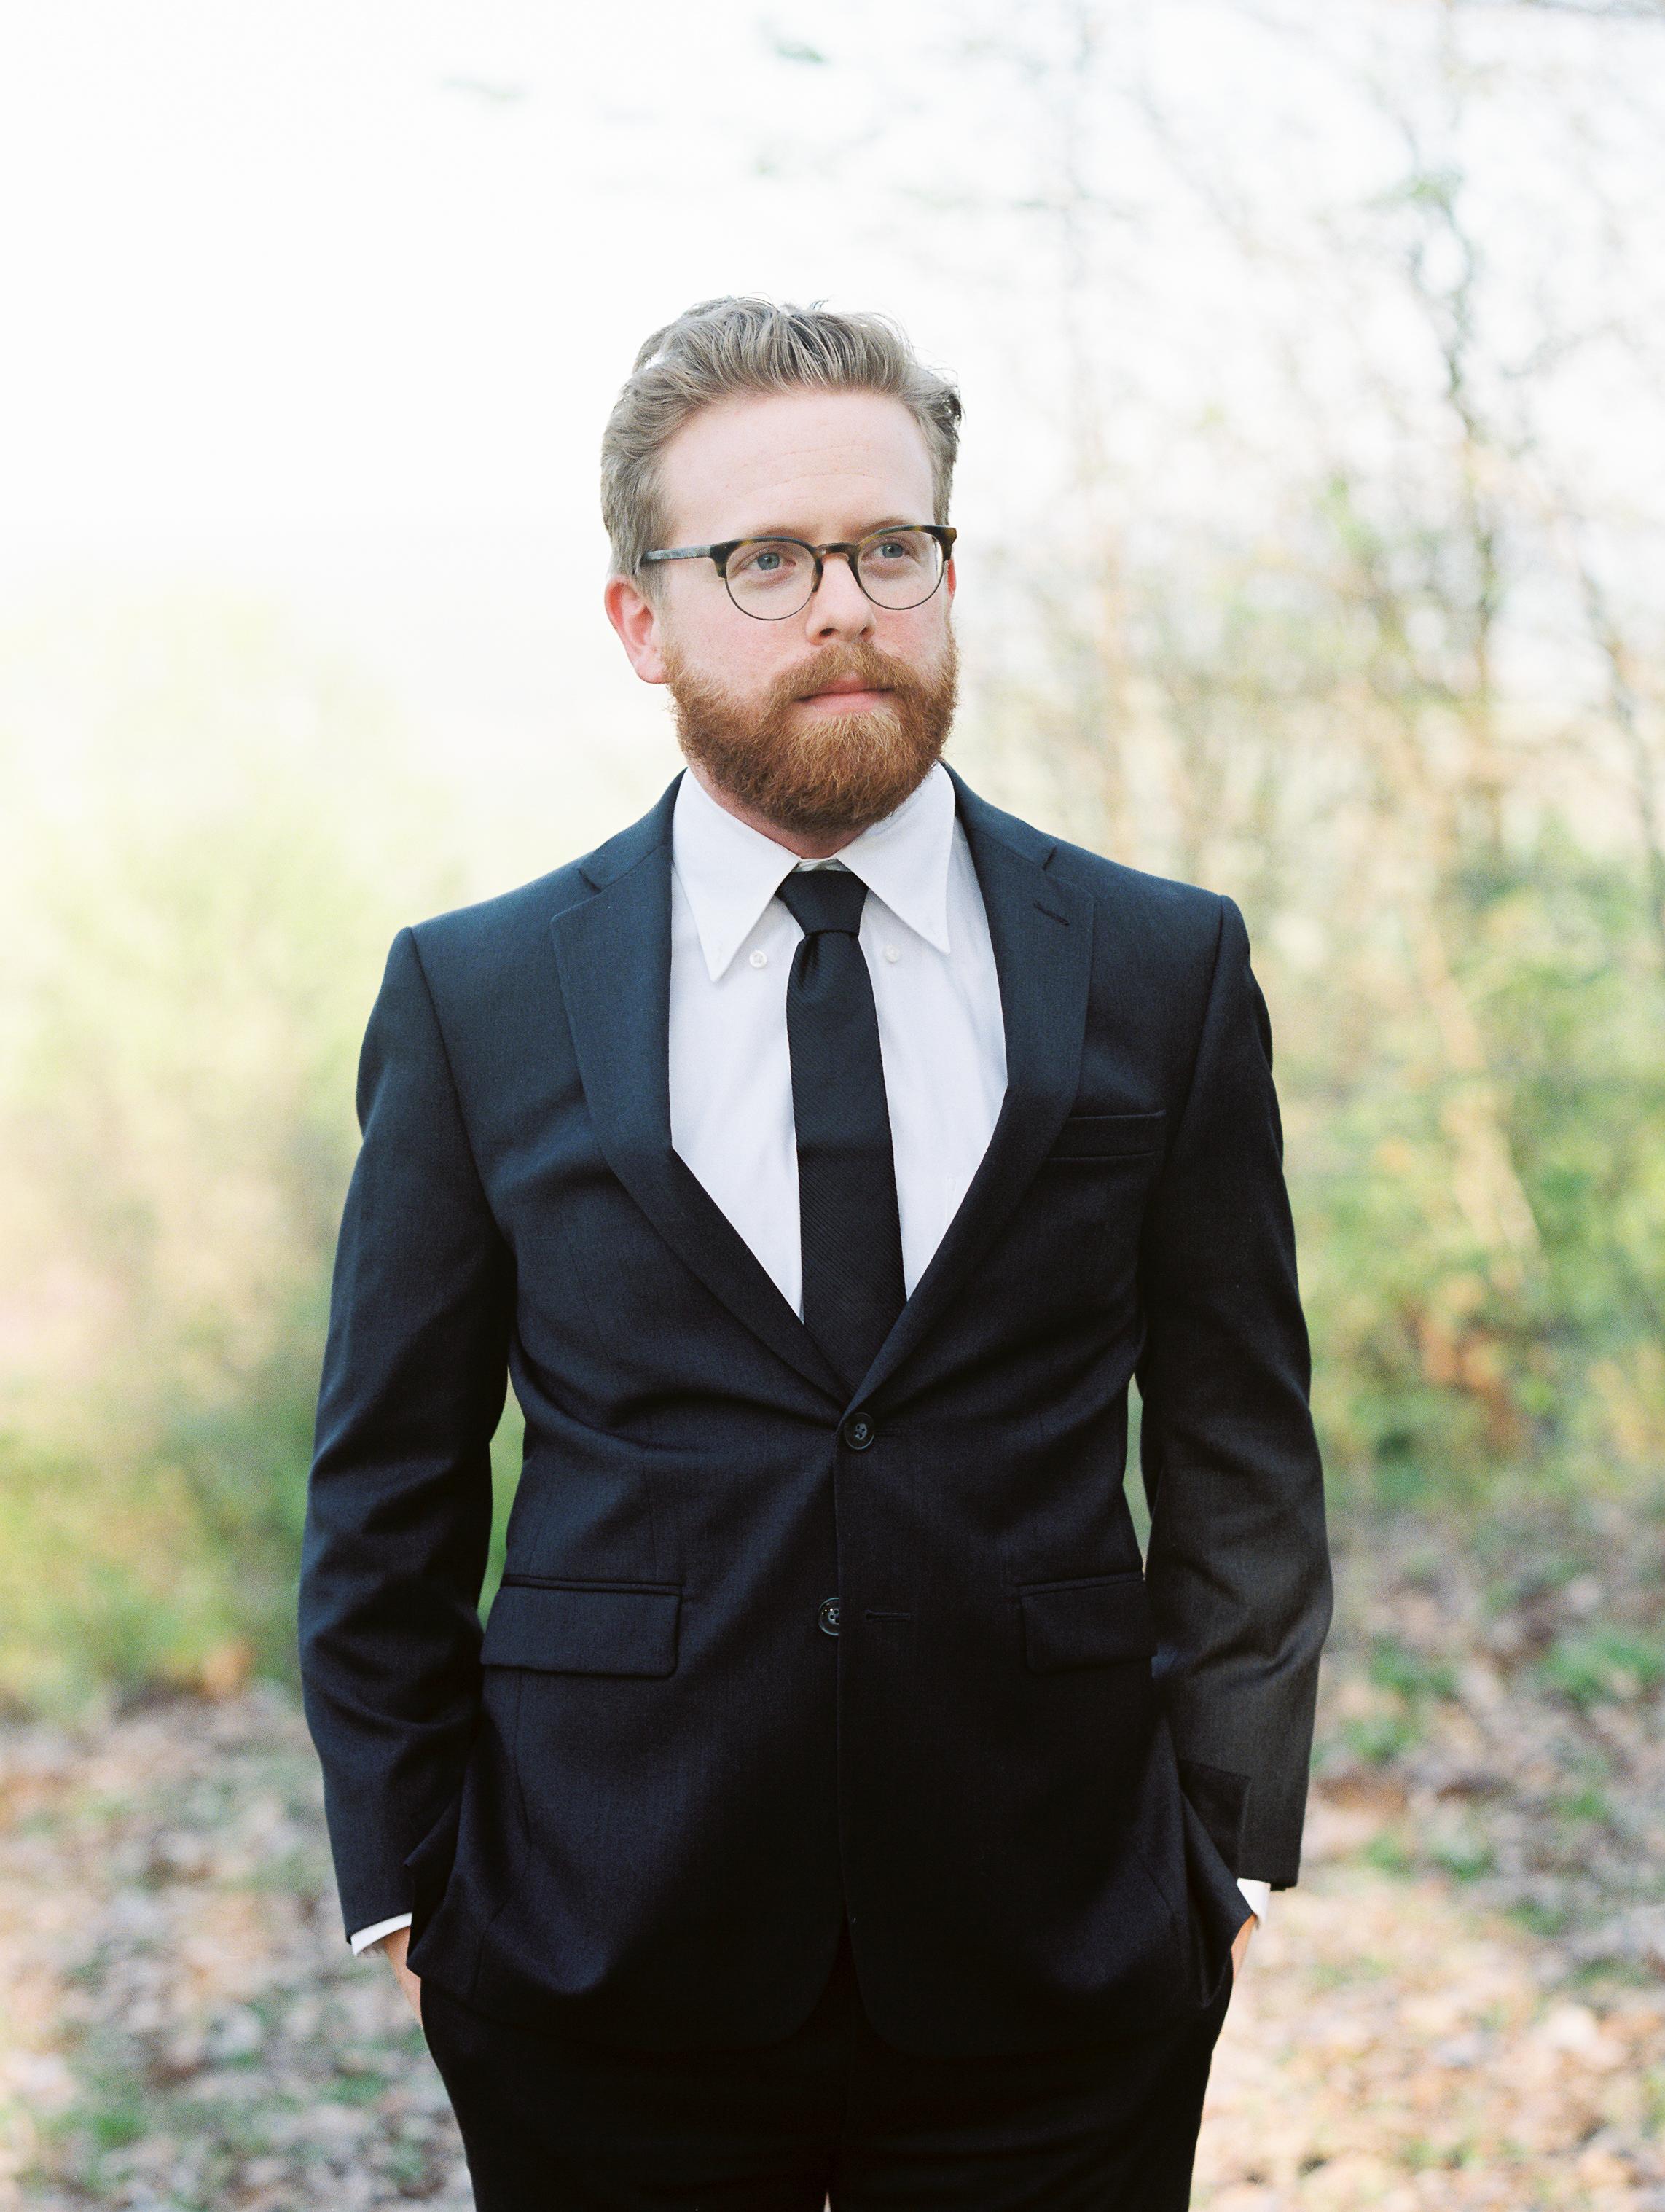 Huntsville-Alabama-Elopement-Intimate-Wedding-Film-Photographer-142.jpg